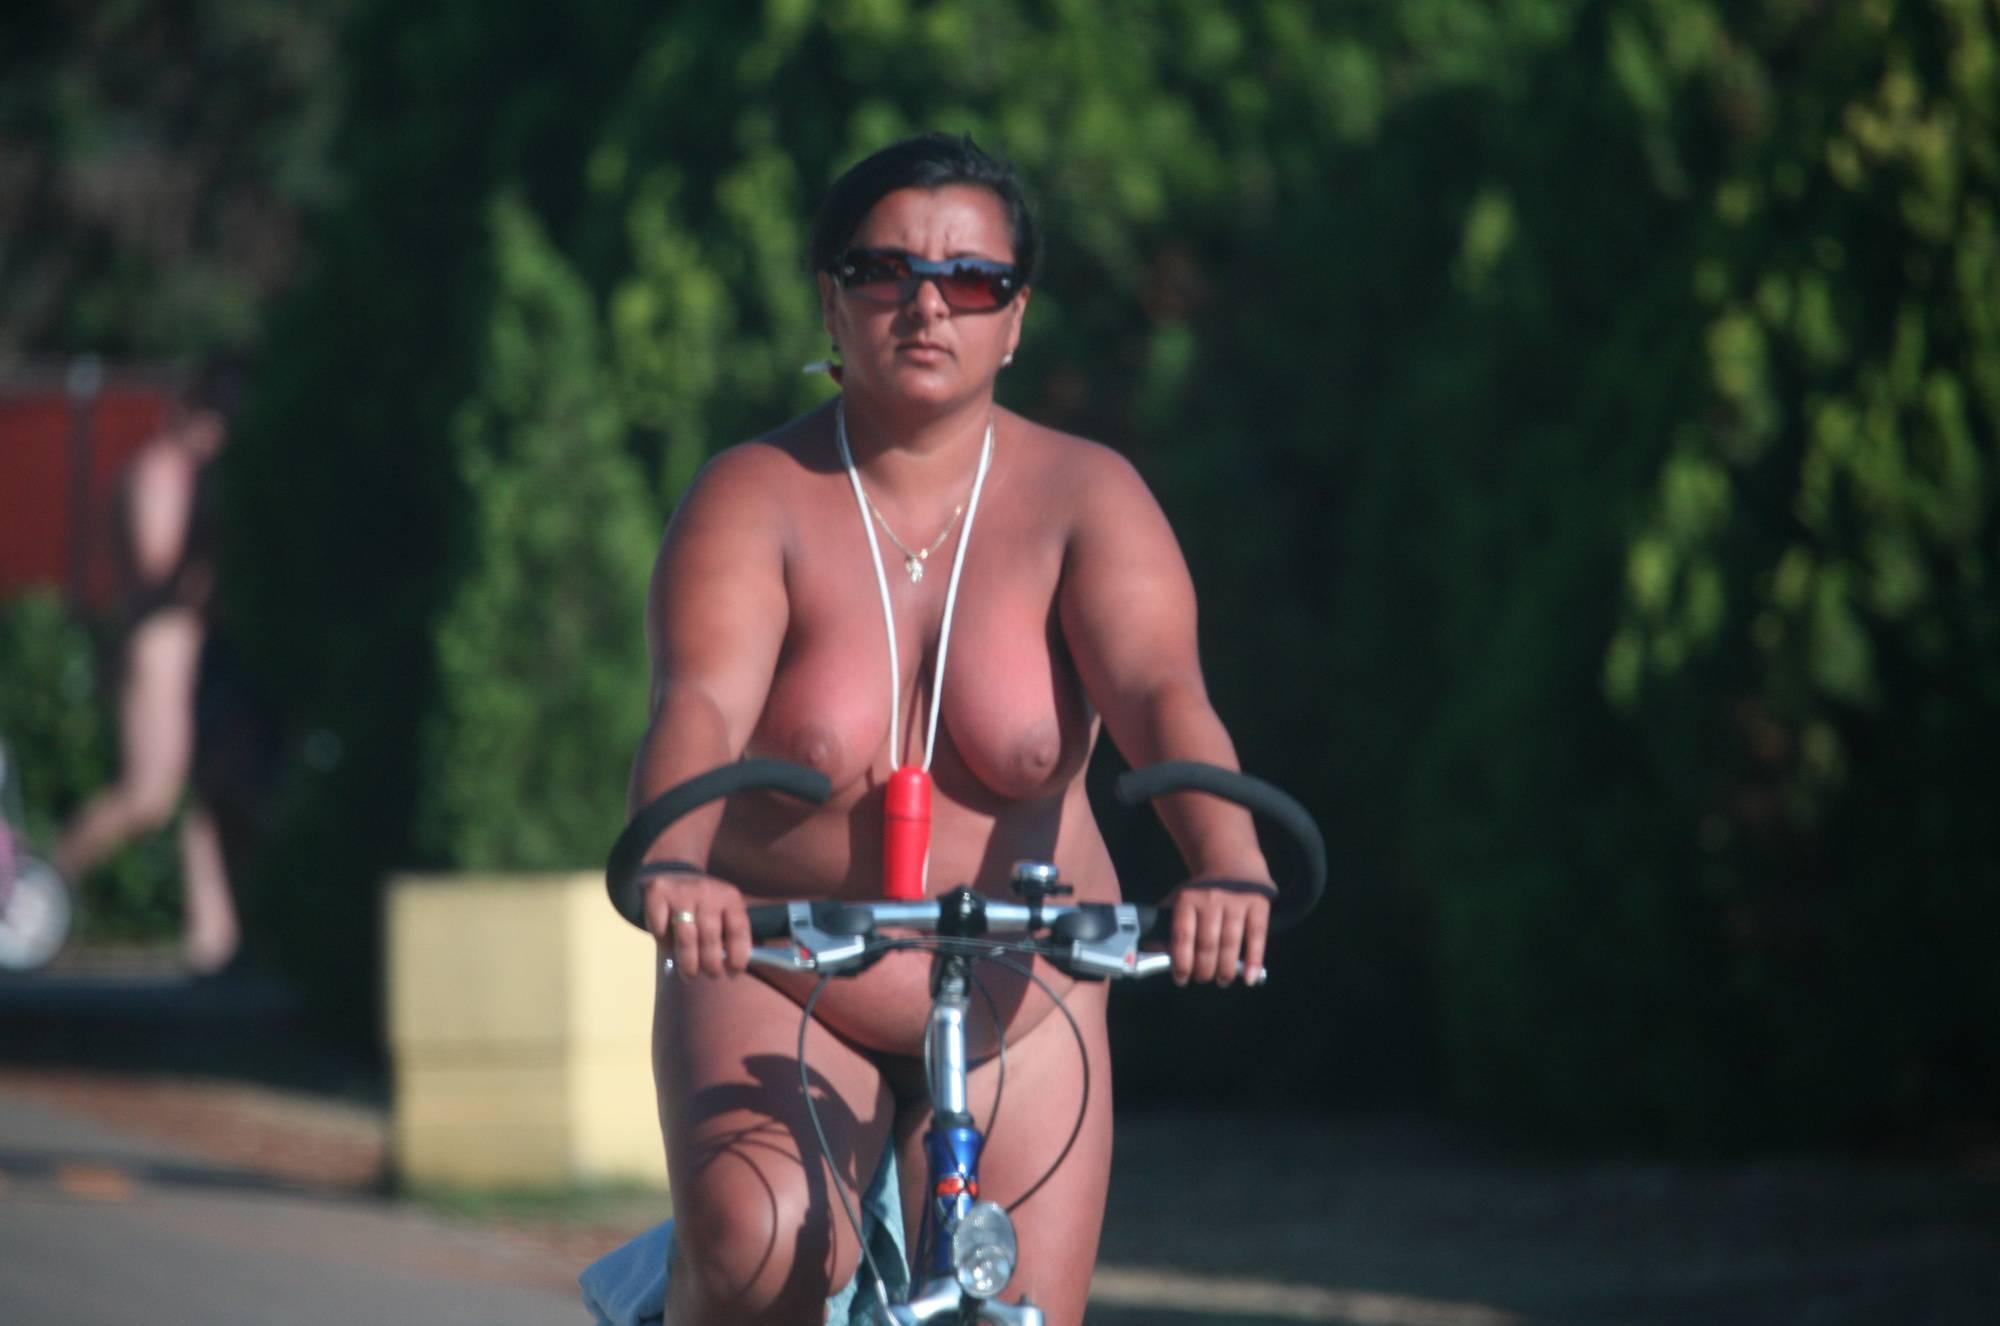 Nora FKK Road Park Biking - 2